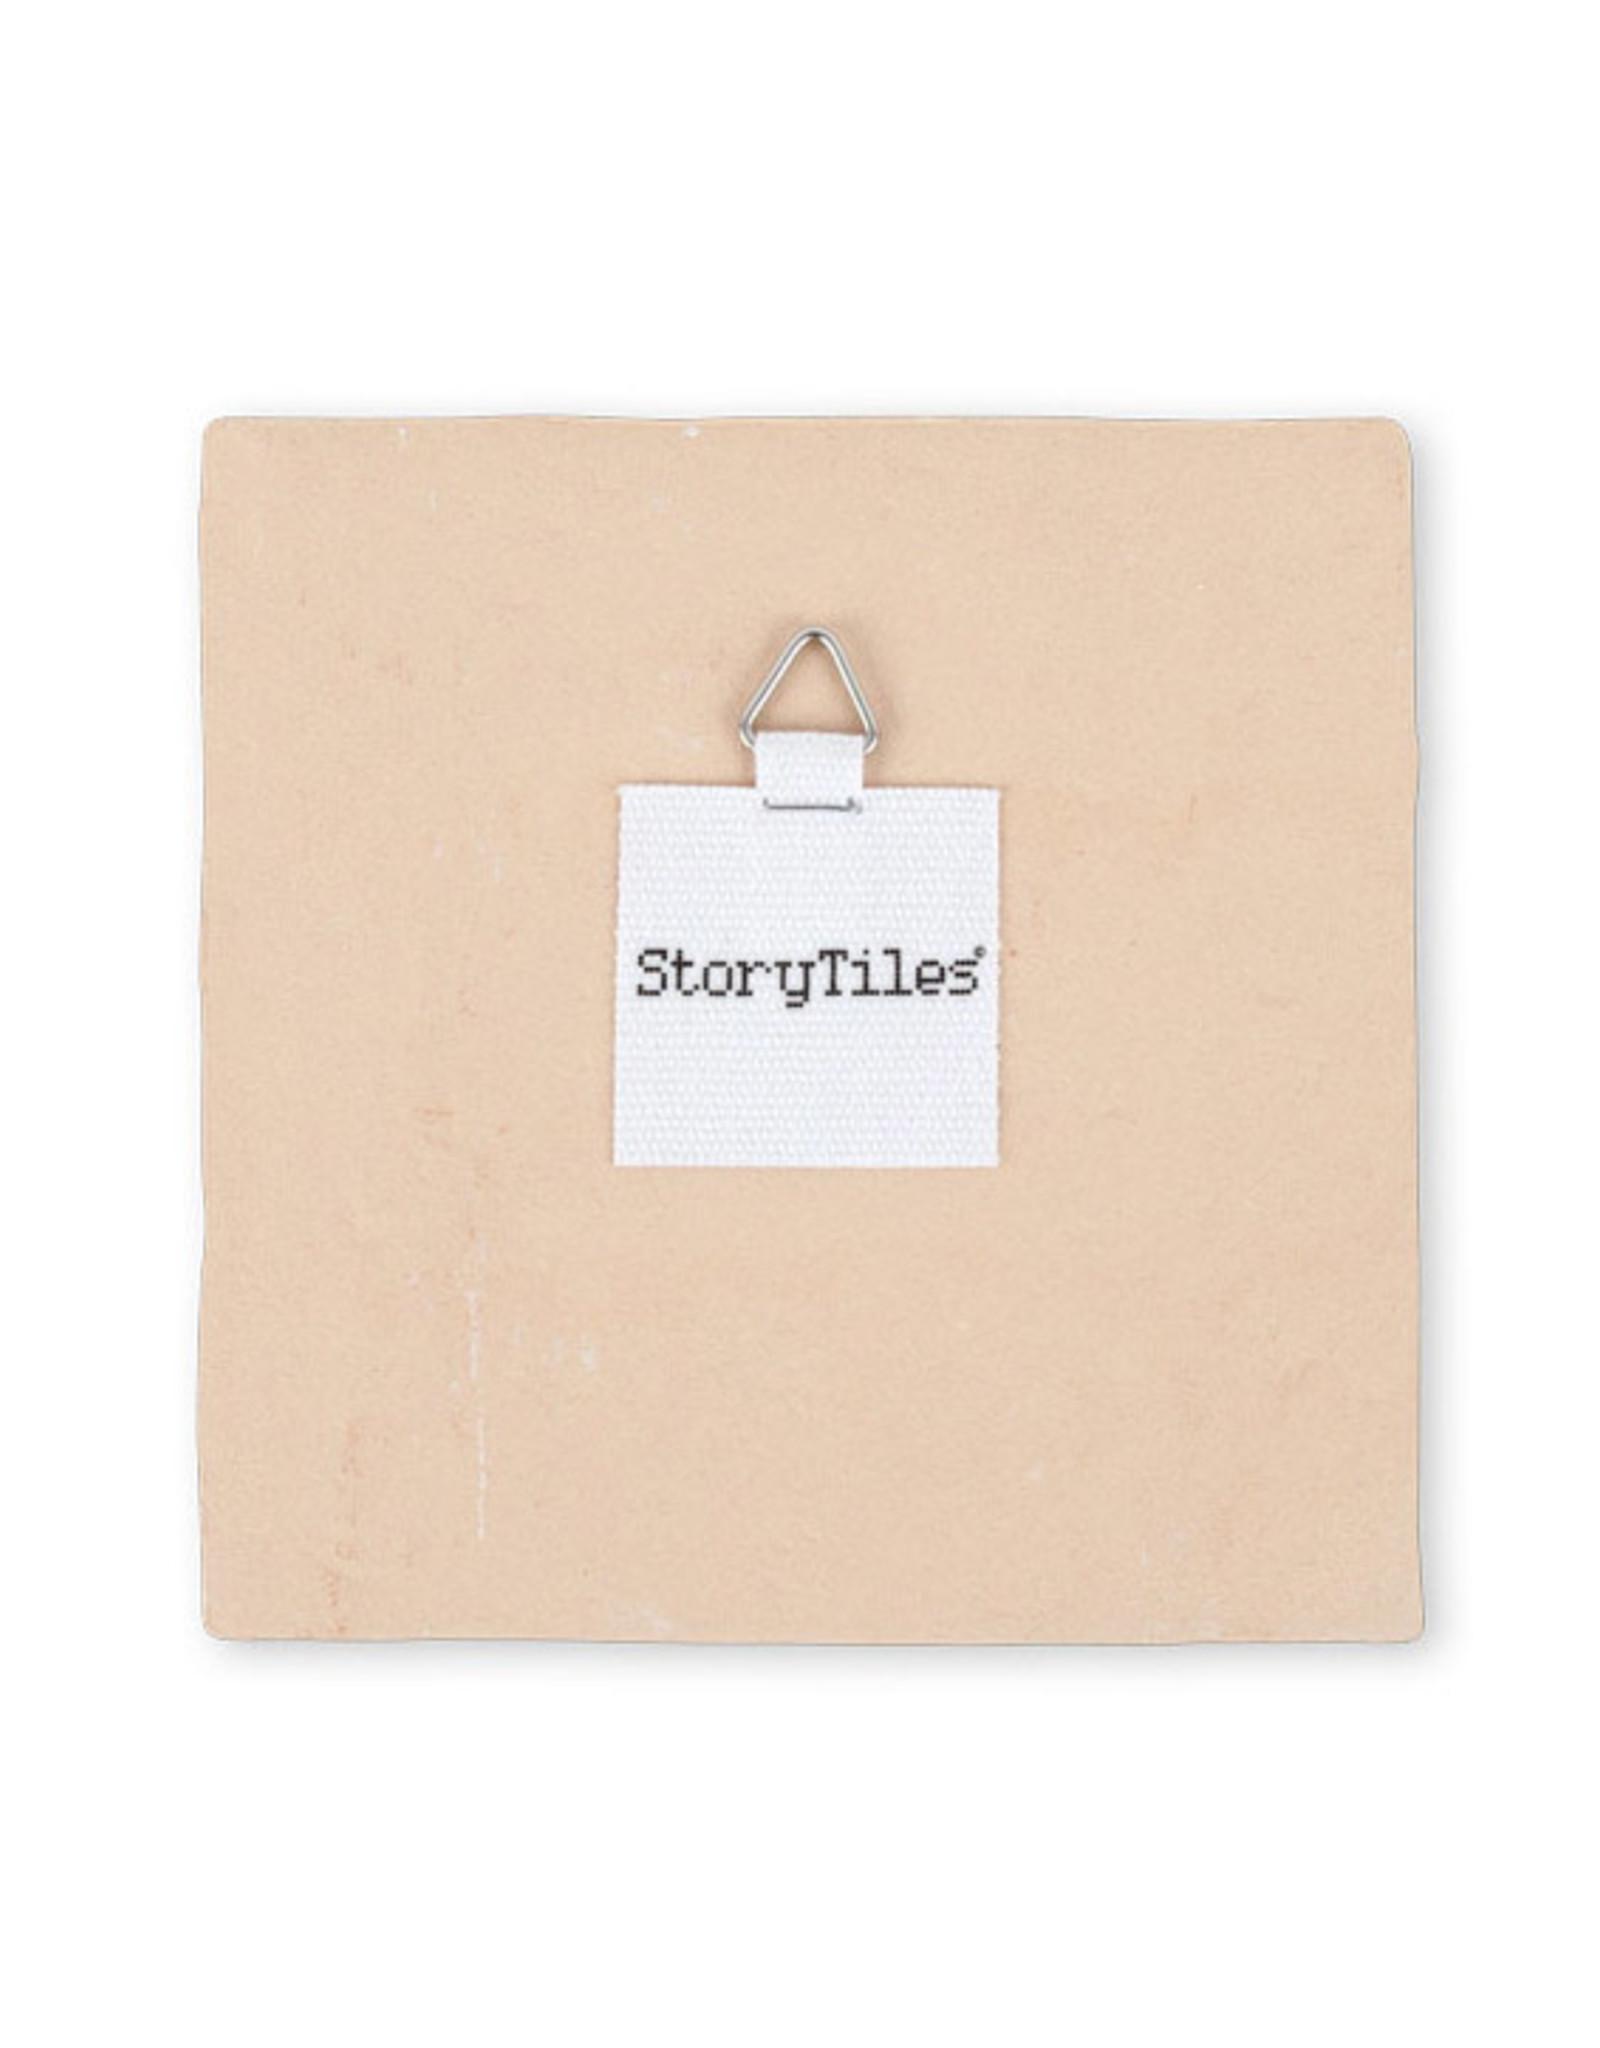 "StoryTiles ""adventurers"" Tile"